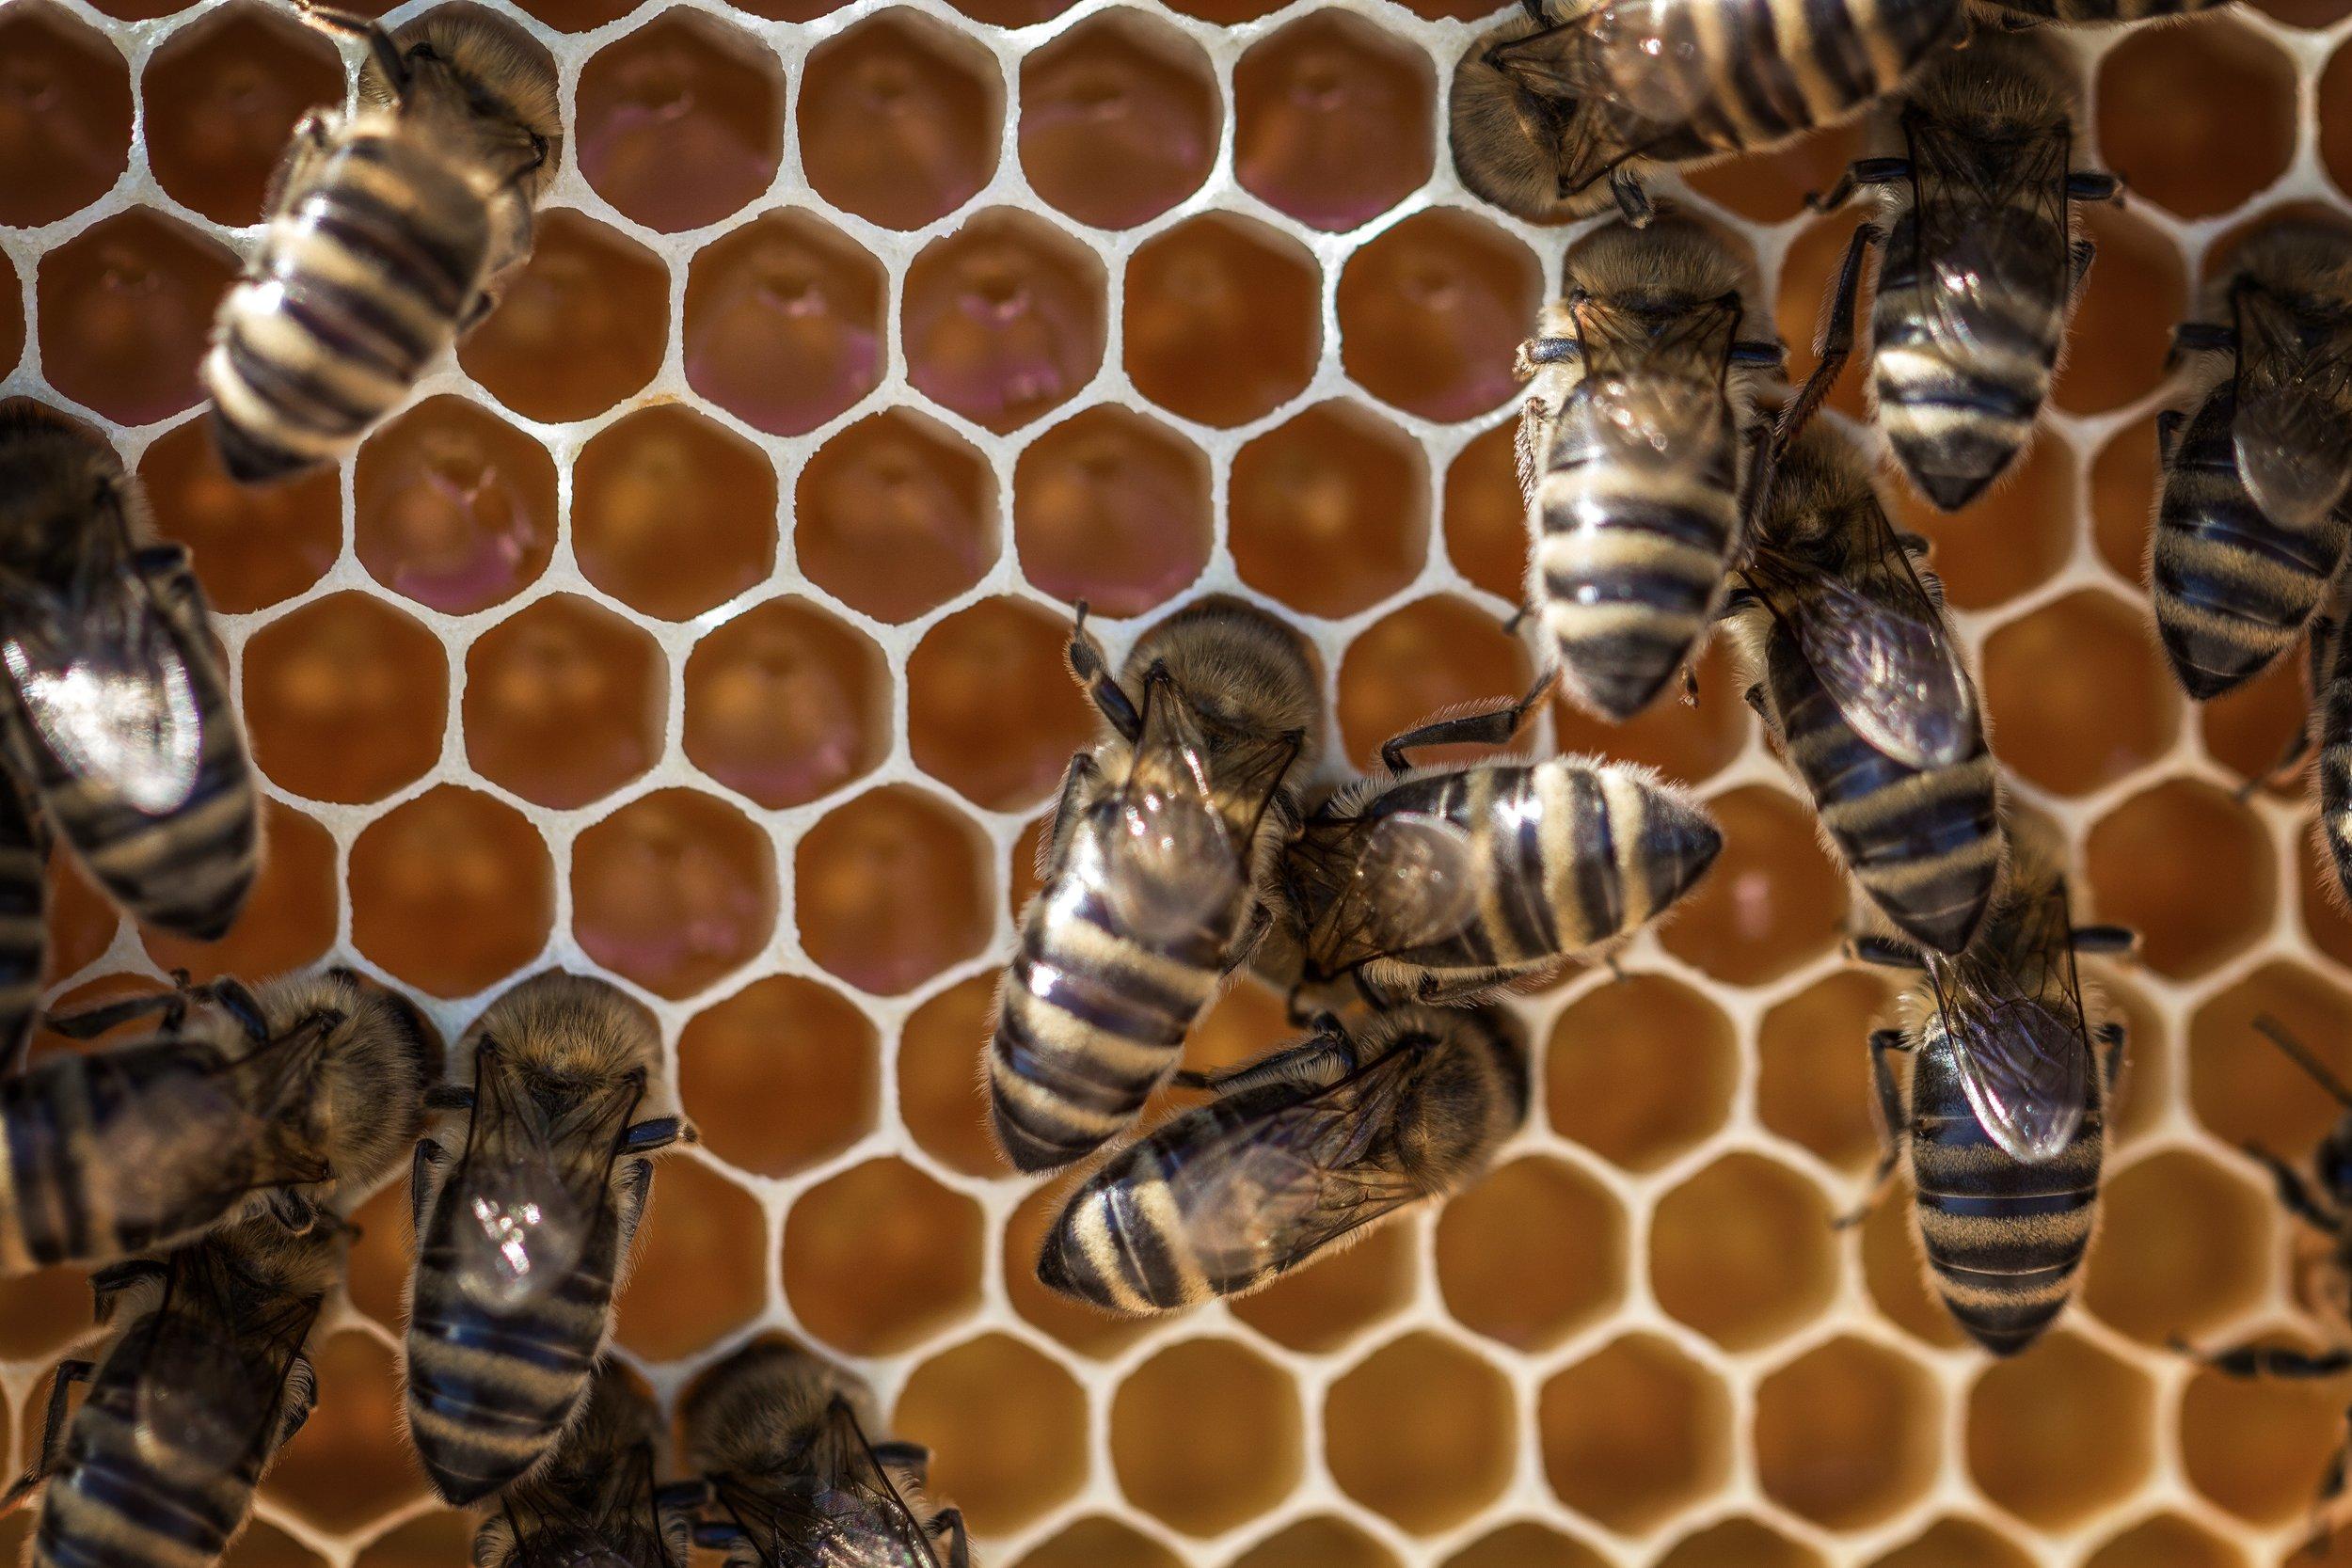 animals-apiary-beehive-928978.jpg